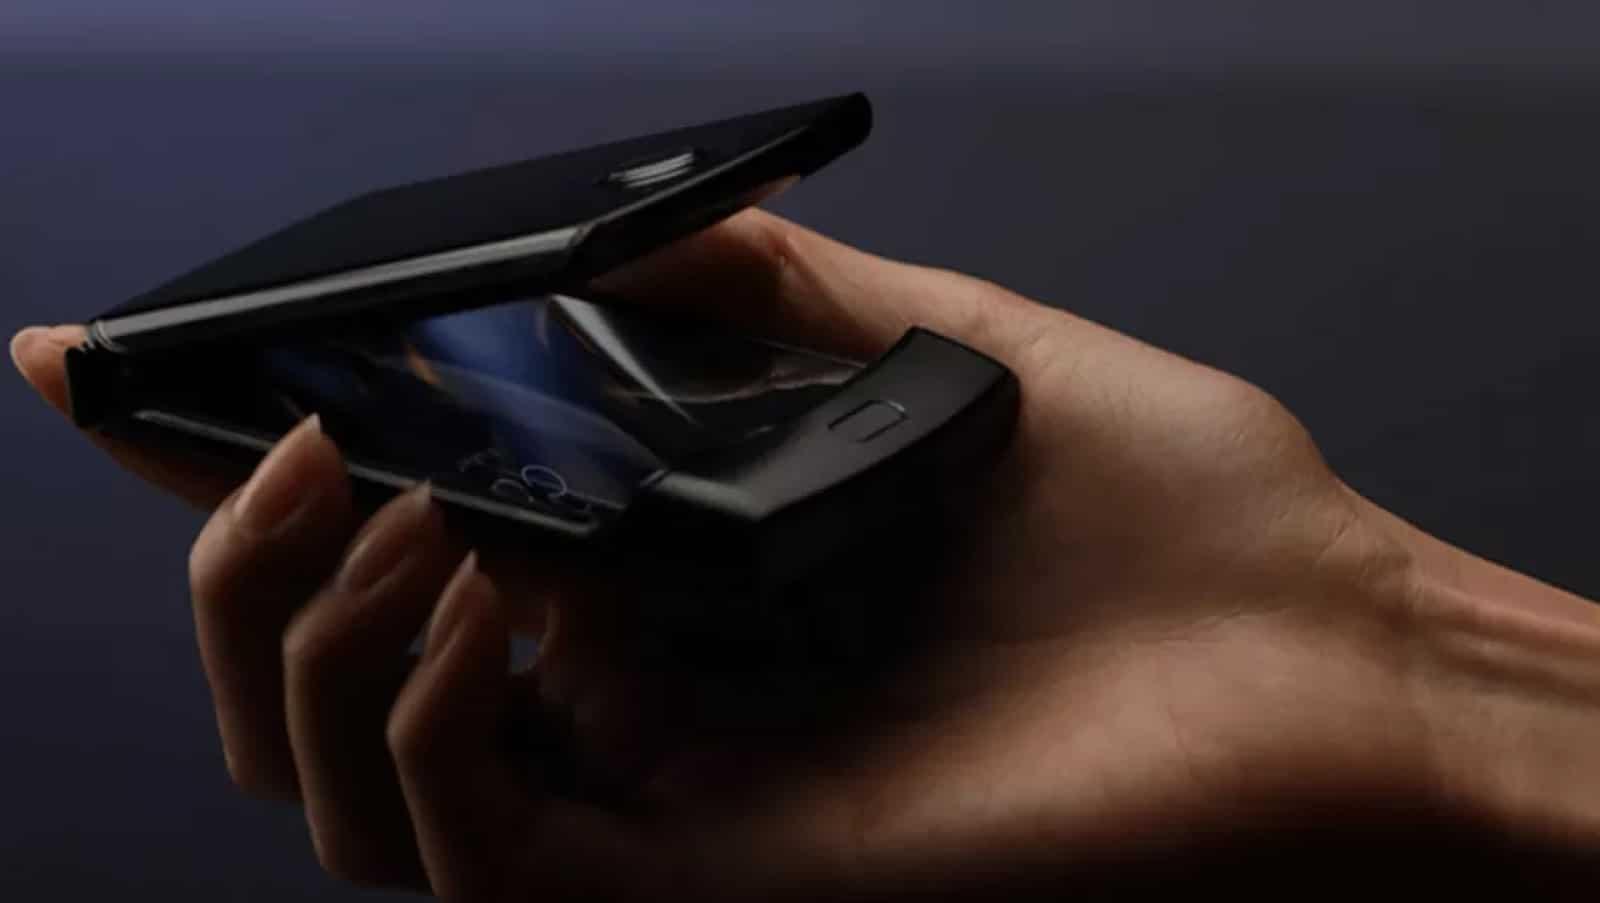 foldable motorola razr phone in a hand